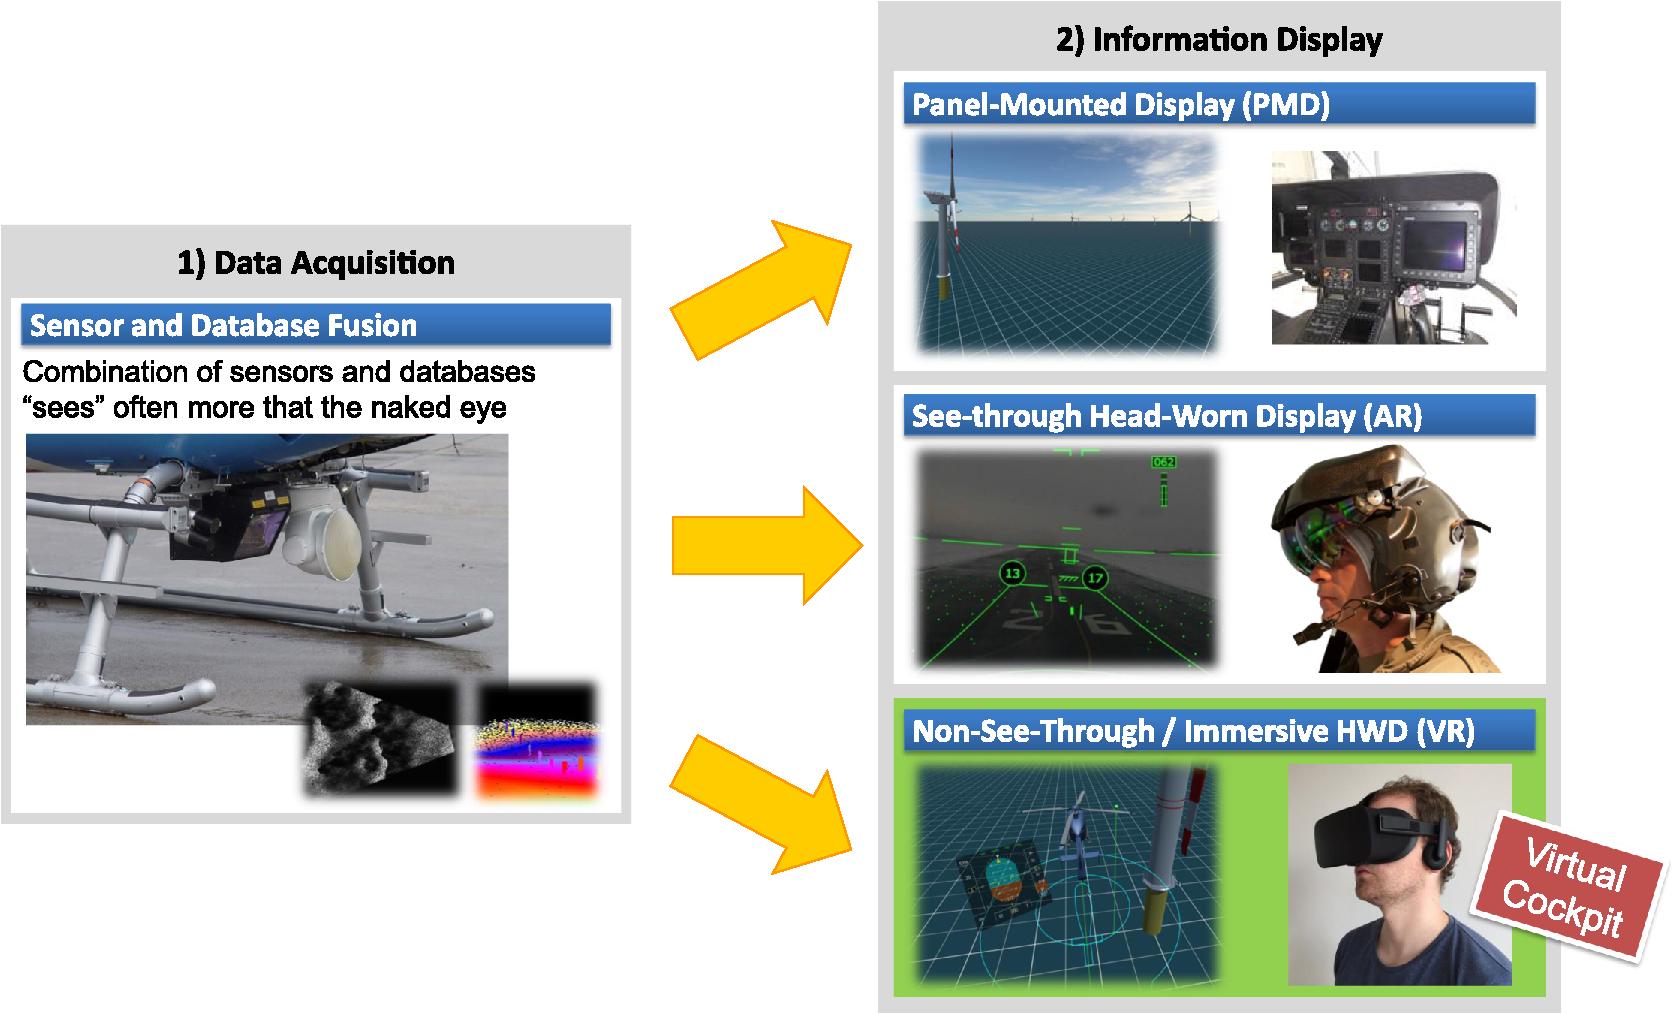 Virtual Cockpit: an immersive head-worn display as human–machine